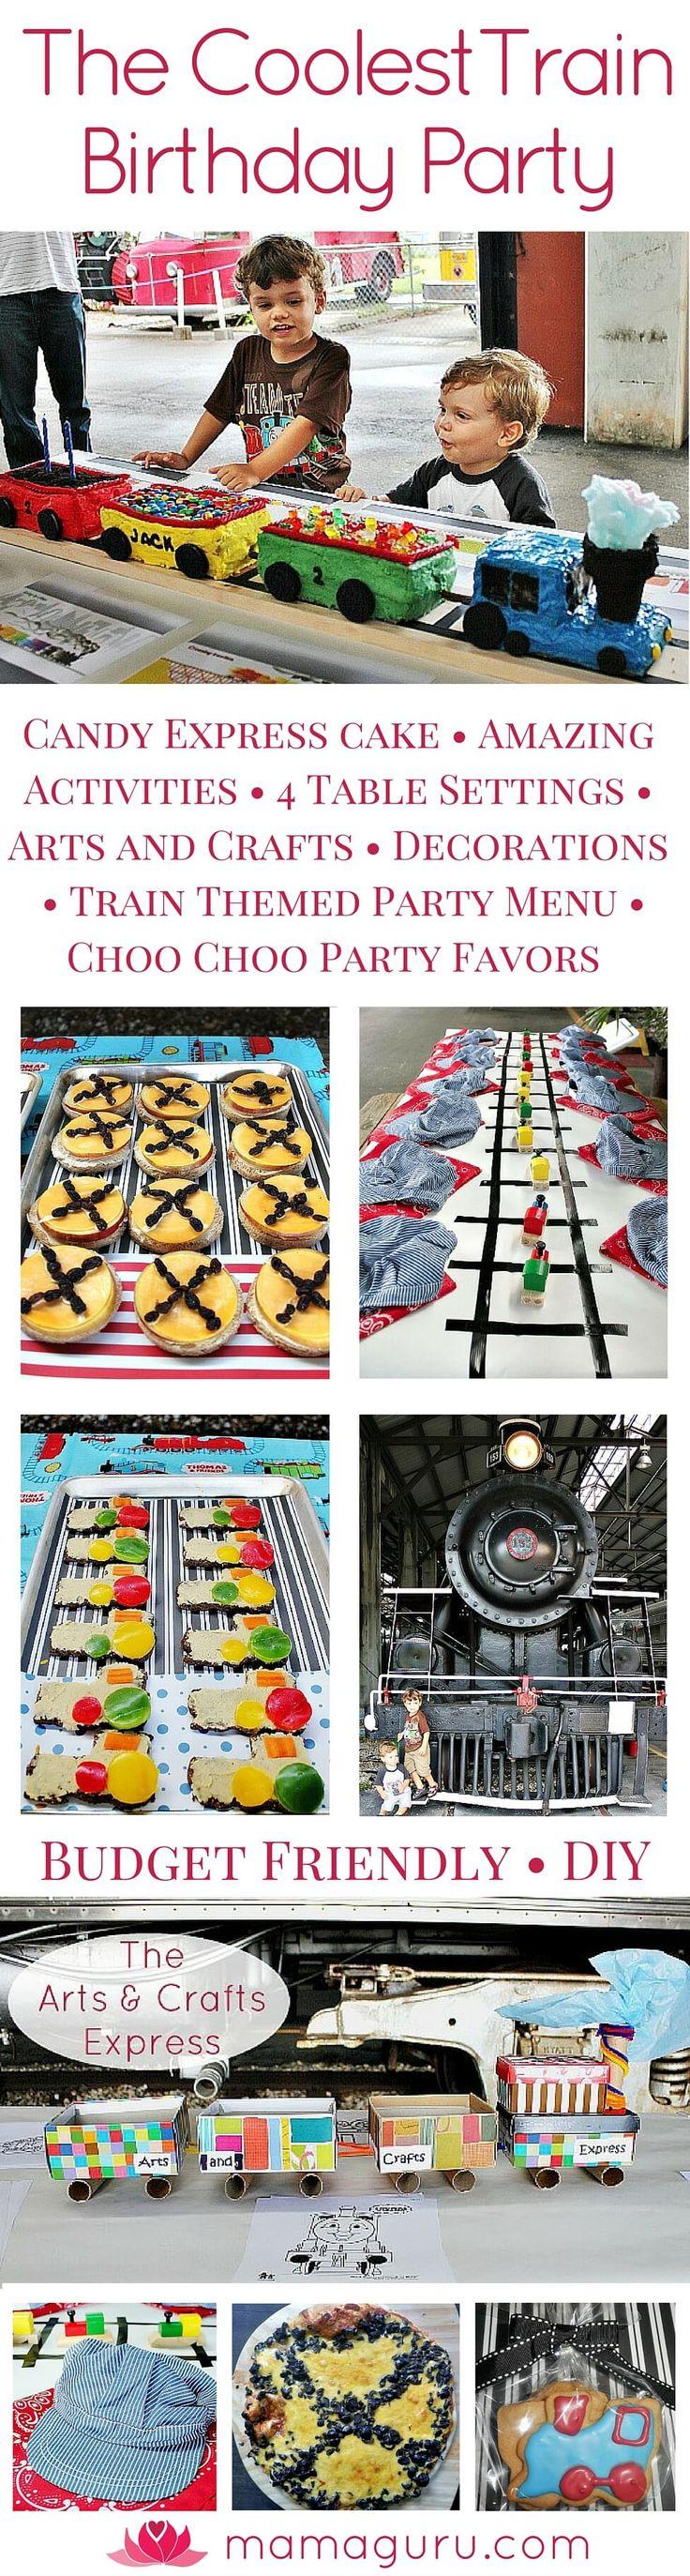 Train Birthday Party • Children's Birthday Party Ideas • Boy Birthday Party • Train Cake